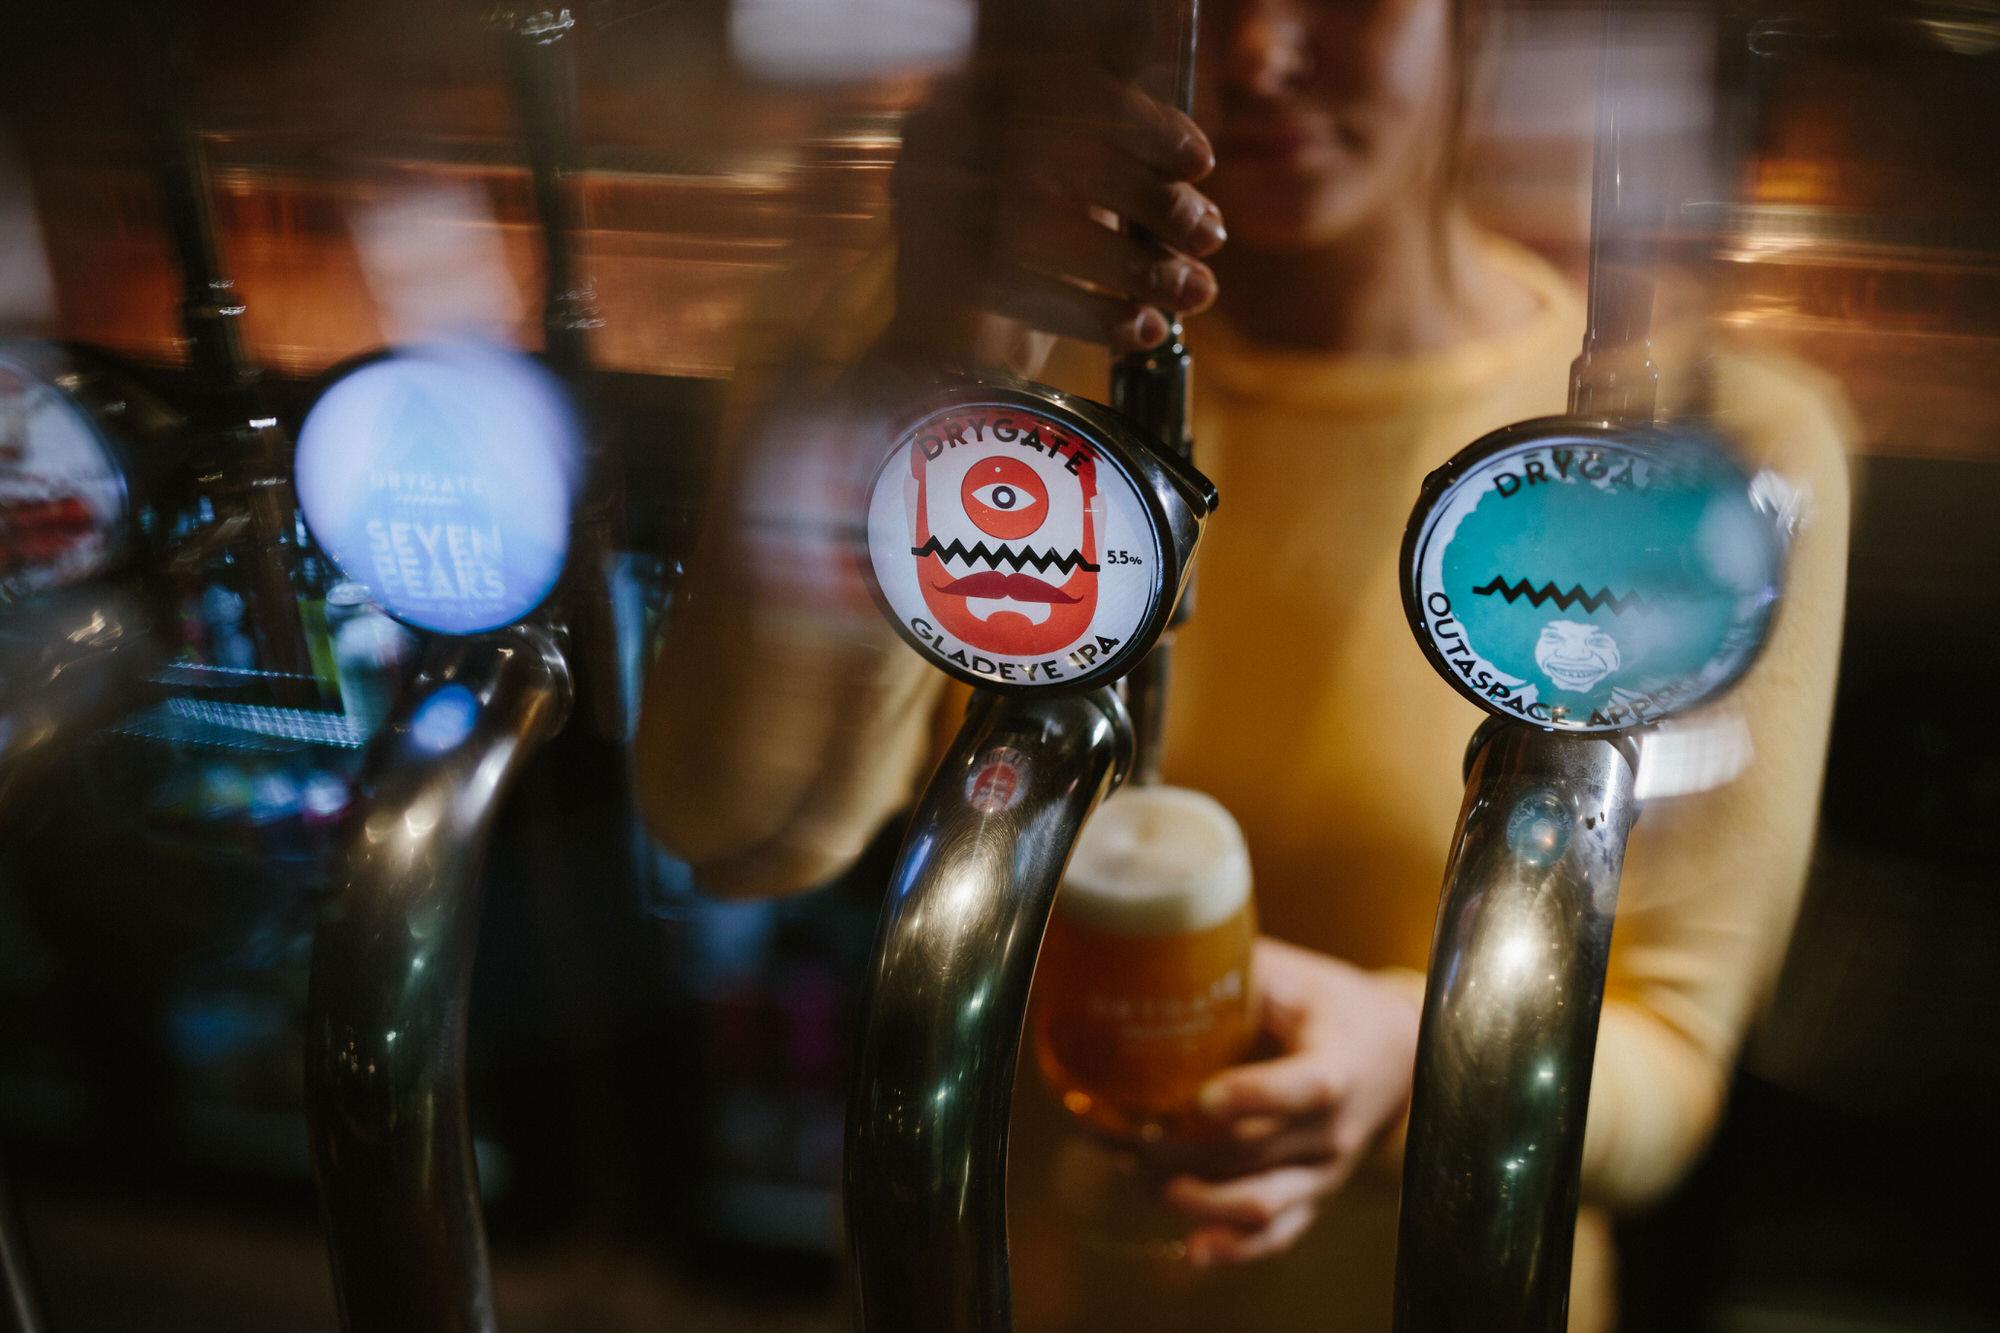 Drygate-Glasgow-Restaurant-Interior-Photography-Brewery-Marketing-Portfolio-003.jpg